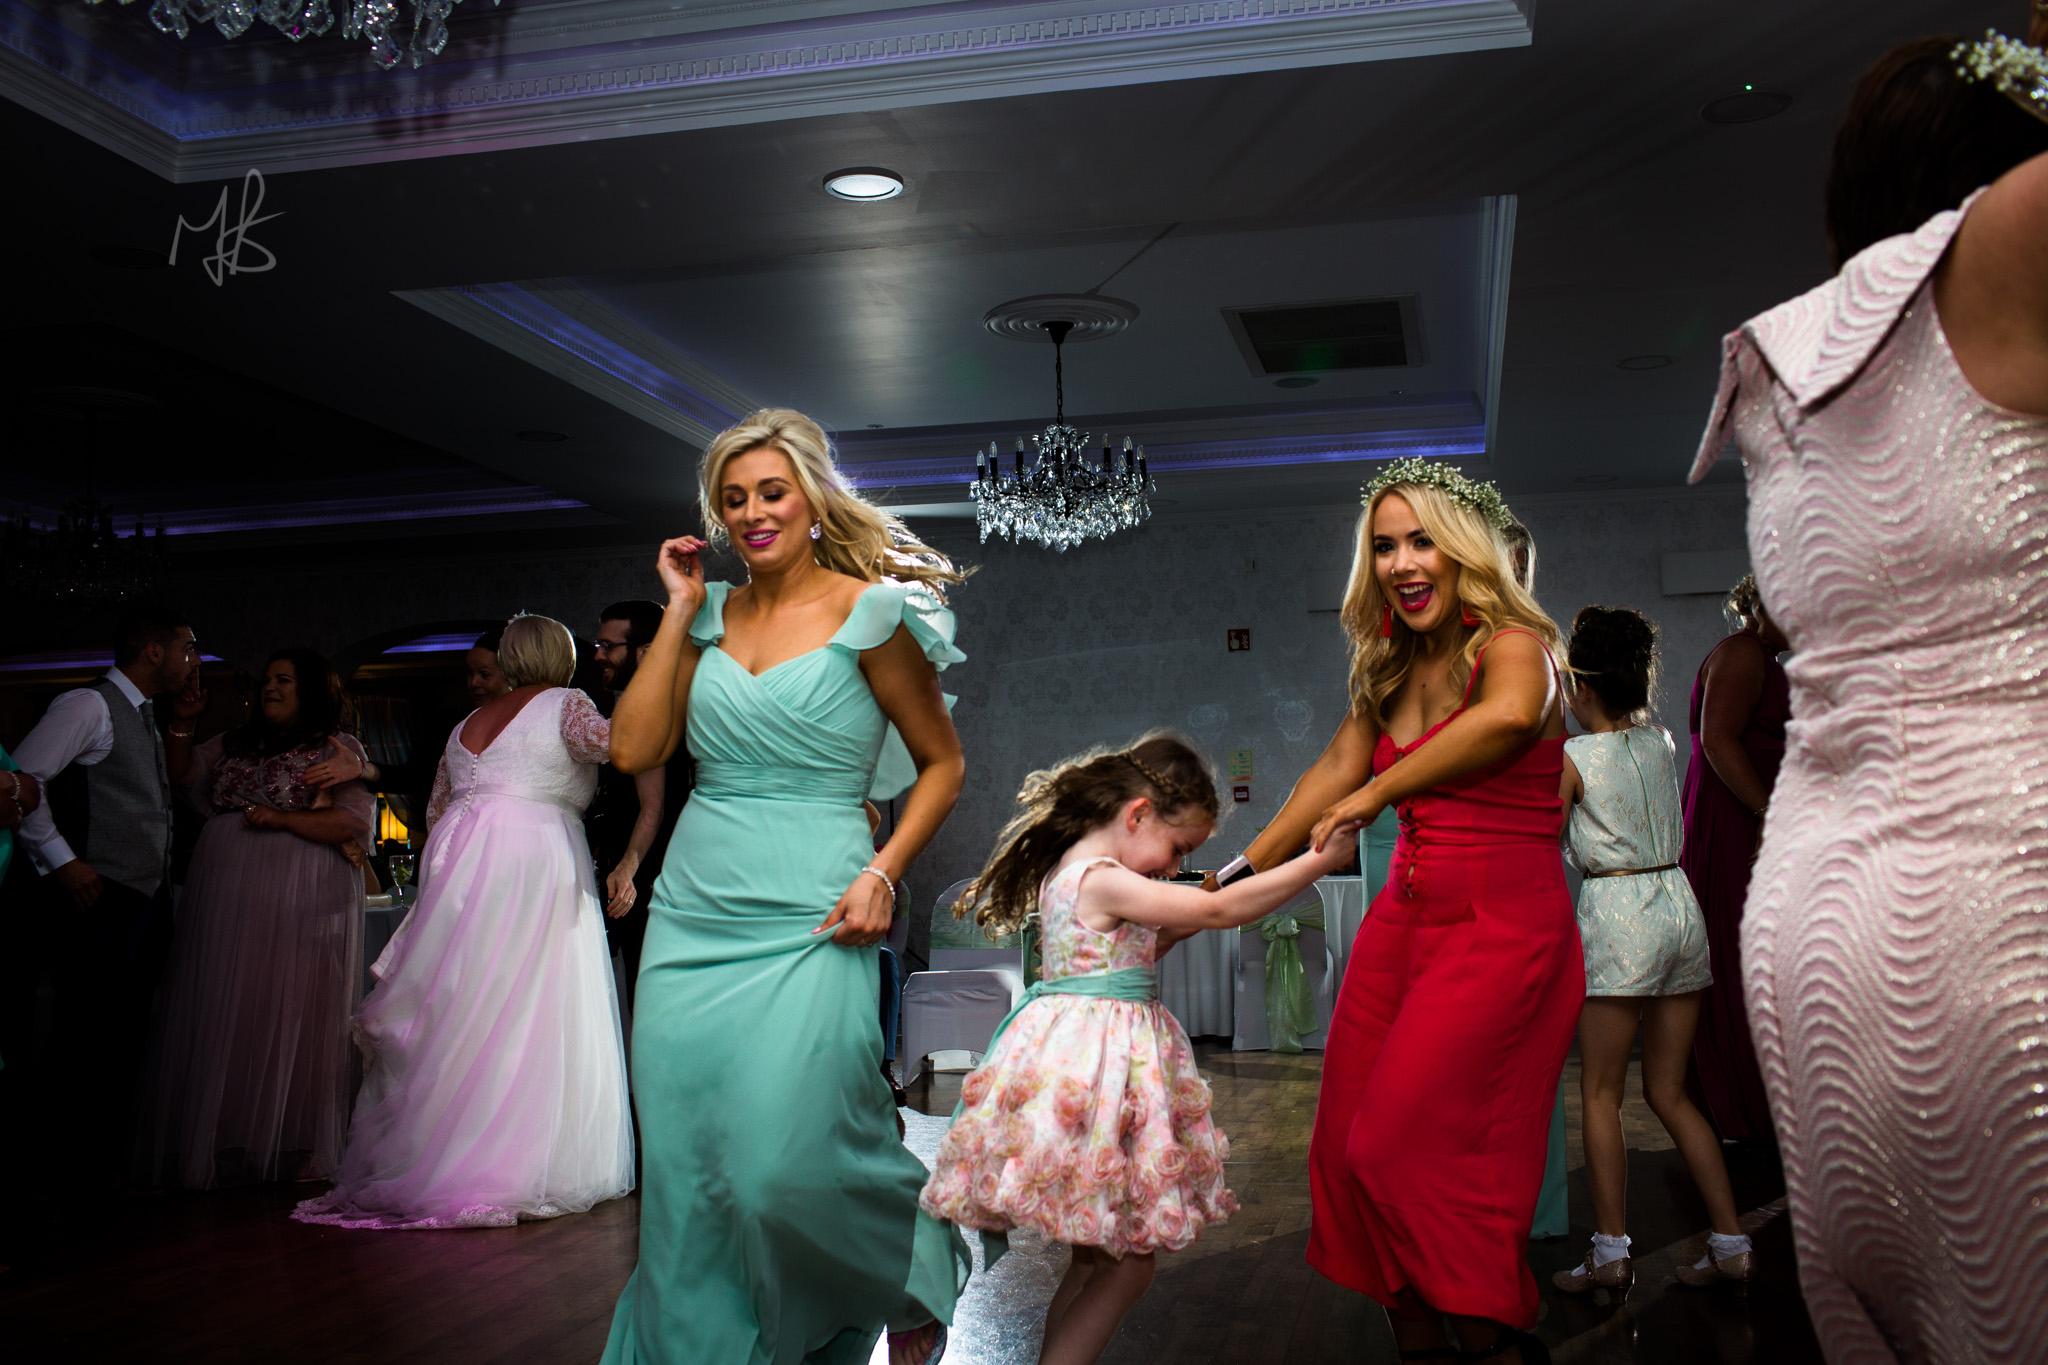 Northern-Ireland-Wedding-Photographer-Mark-Barnes-Ballymena_wedding-photography-Leighinmohr-House-Seamas_Alanna_For-web-64.jpg